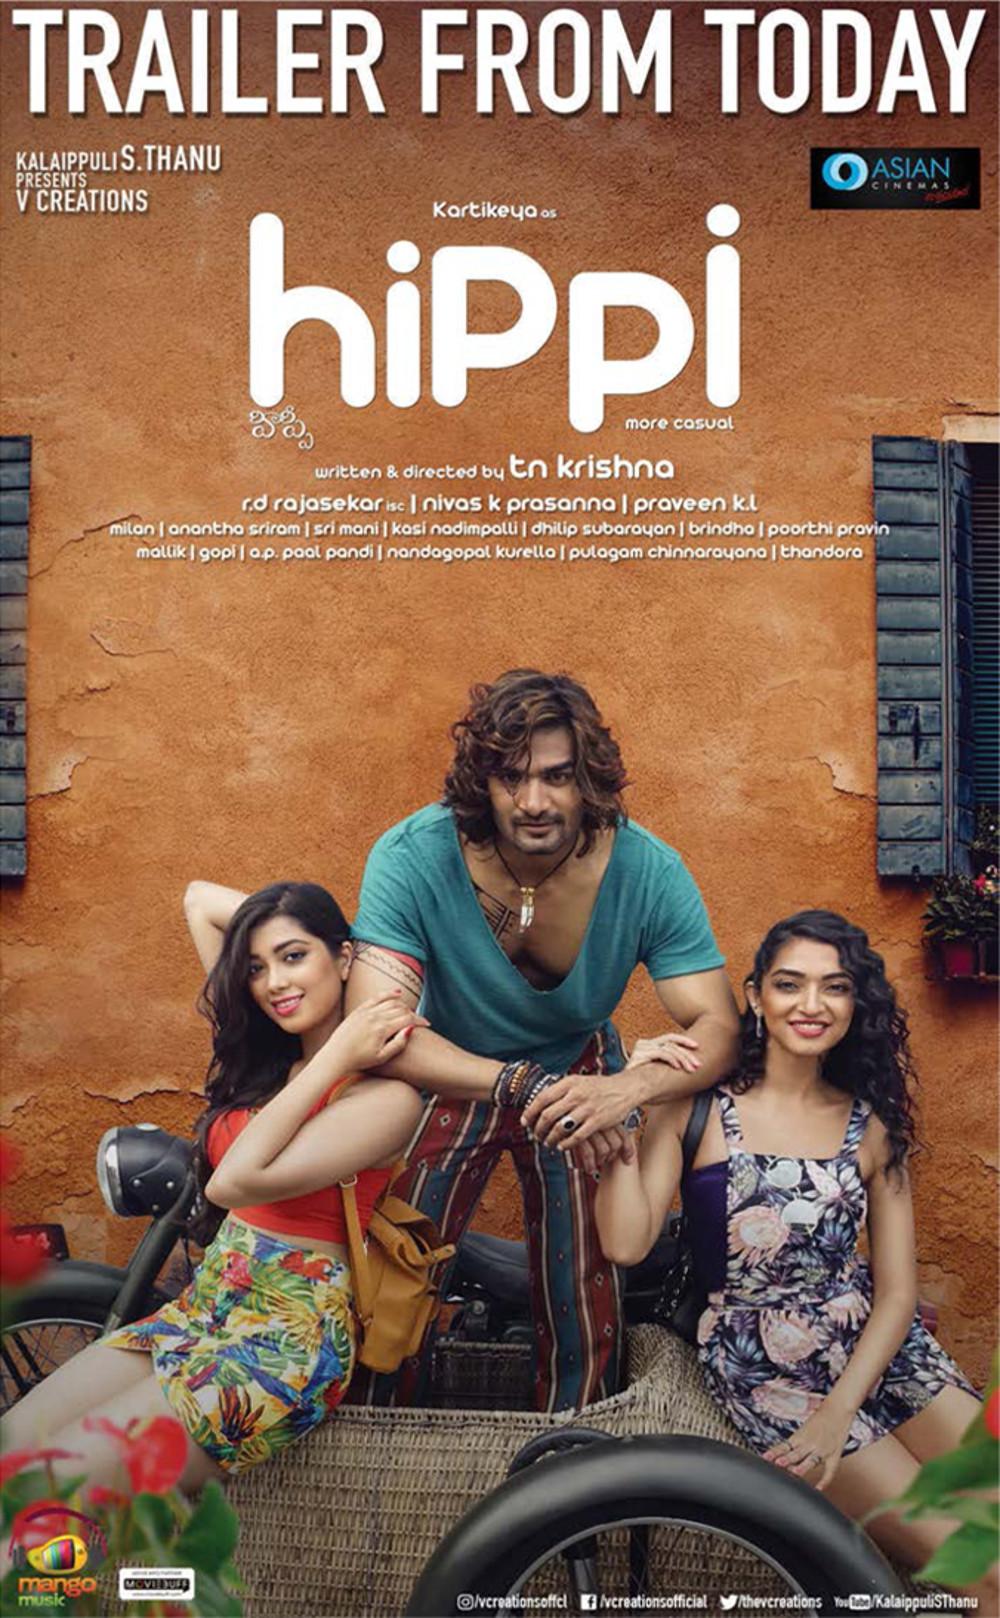 Hippi Movie Trailer Release Posters Kartikeya Digangana Suryavanshi 05c7b38